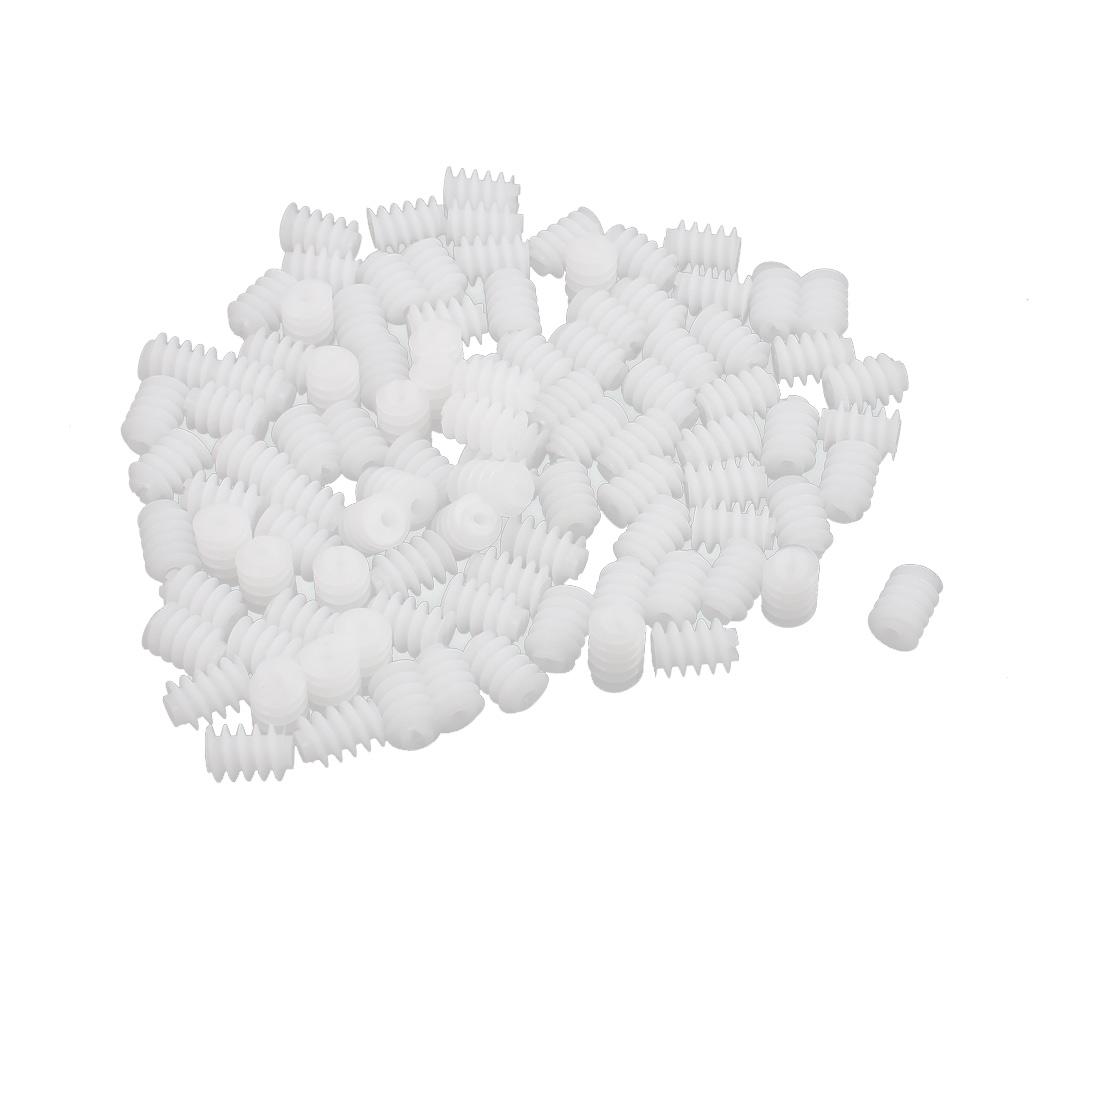 100PCS 9mm Length 6mm Thread Diameter Plastic Worm Gear Wheel for RC Toy Car